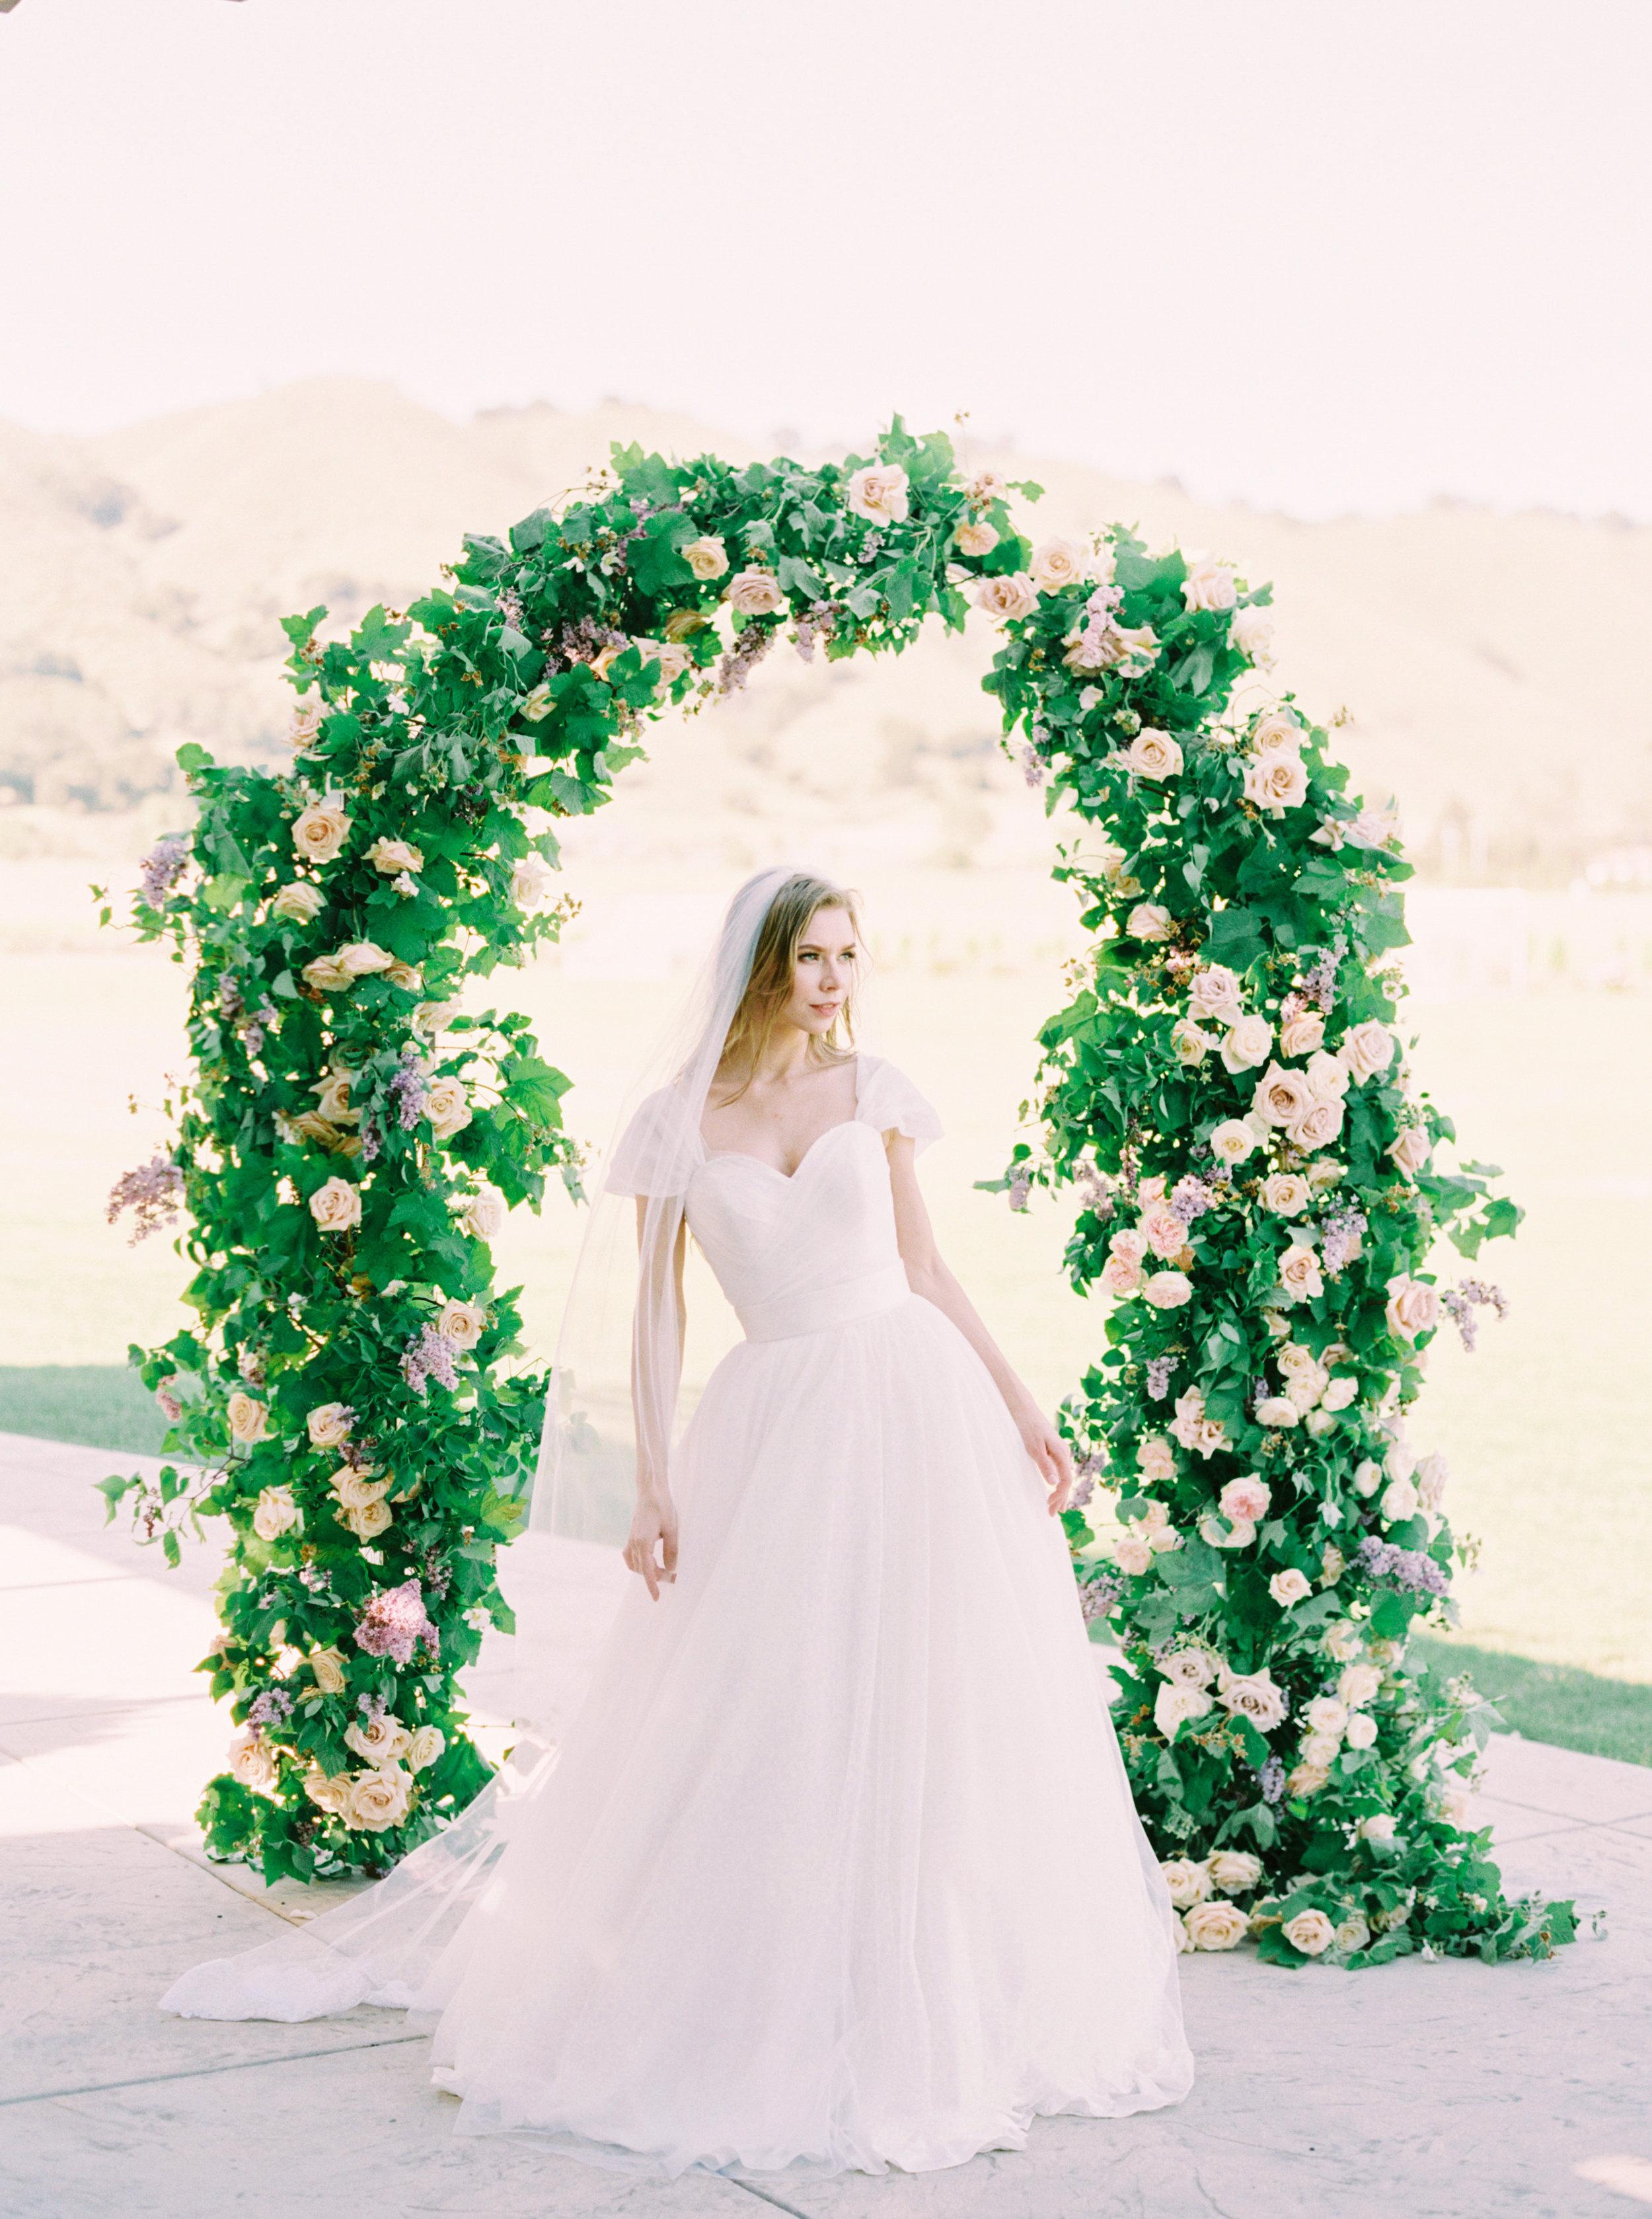 This-Love-of-Yours-Kirigin-Cellars-Flower-Arch-Styled-Shoot-106.jpg